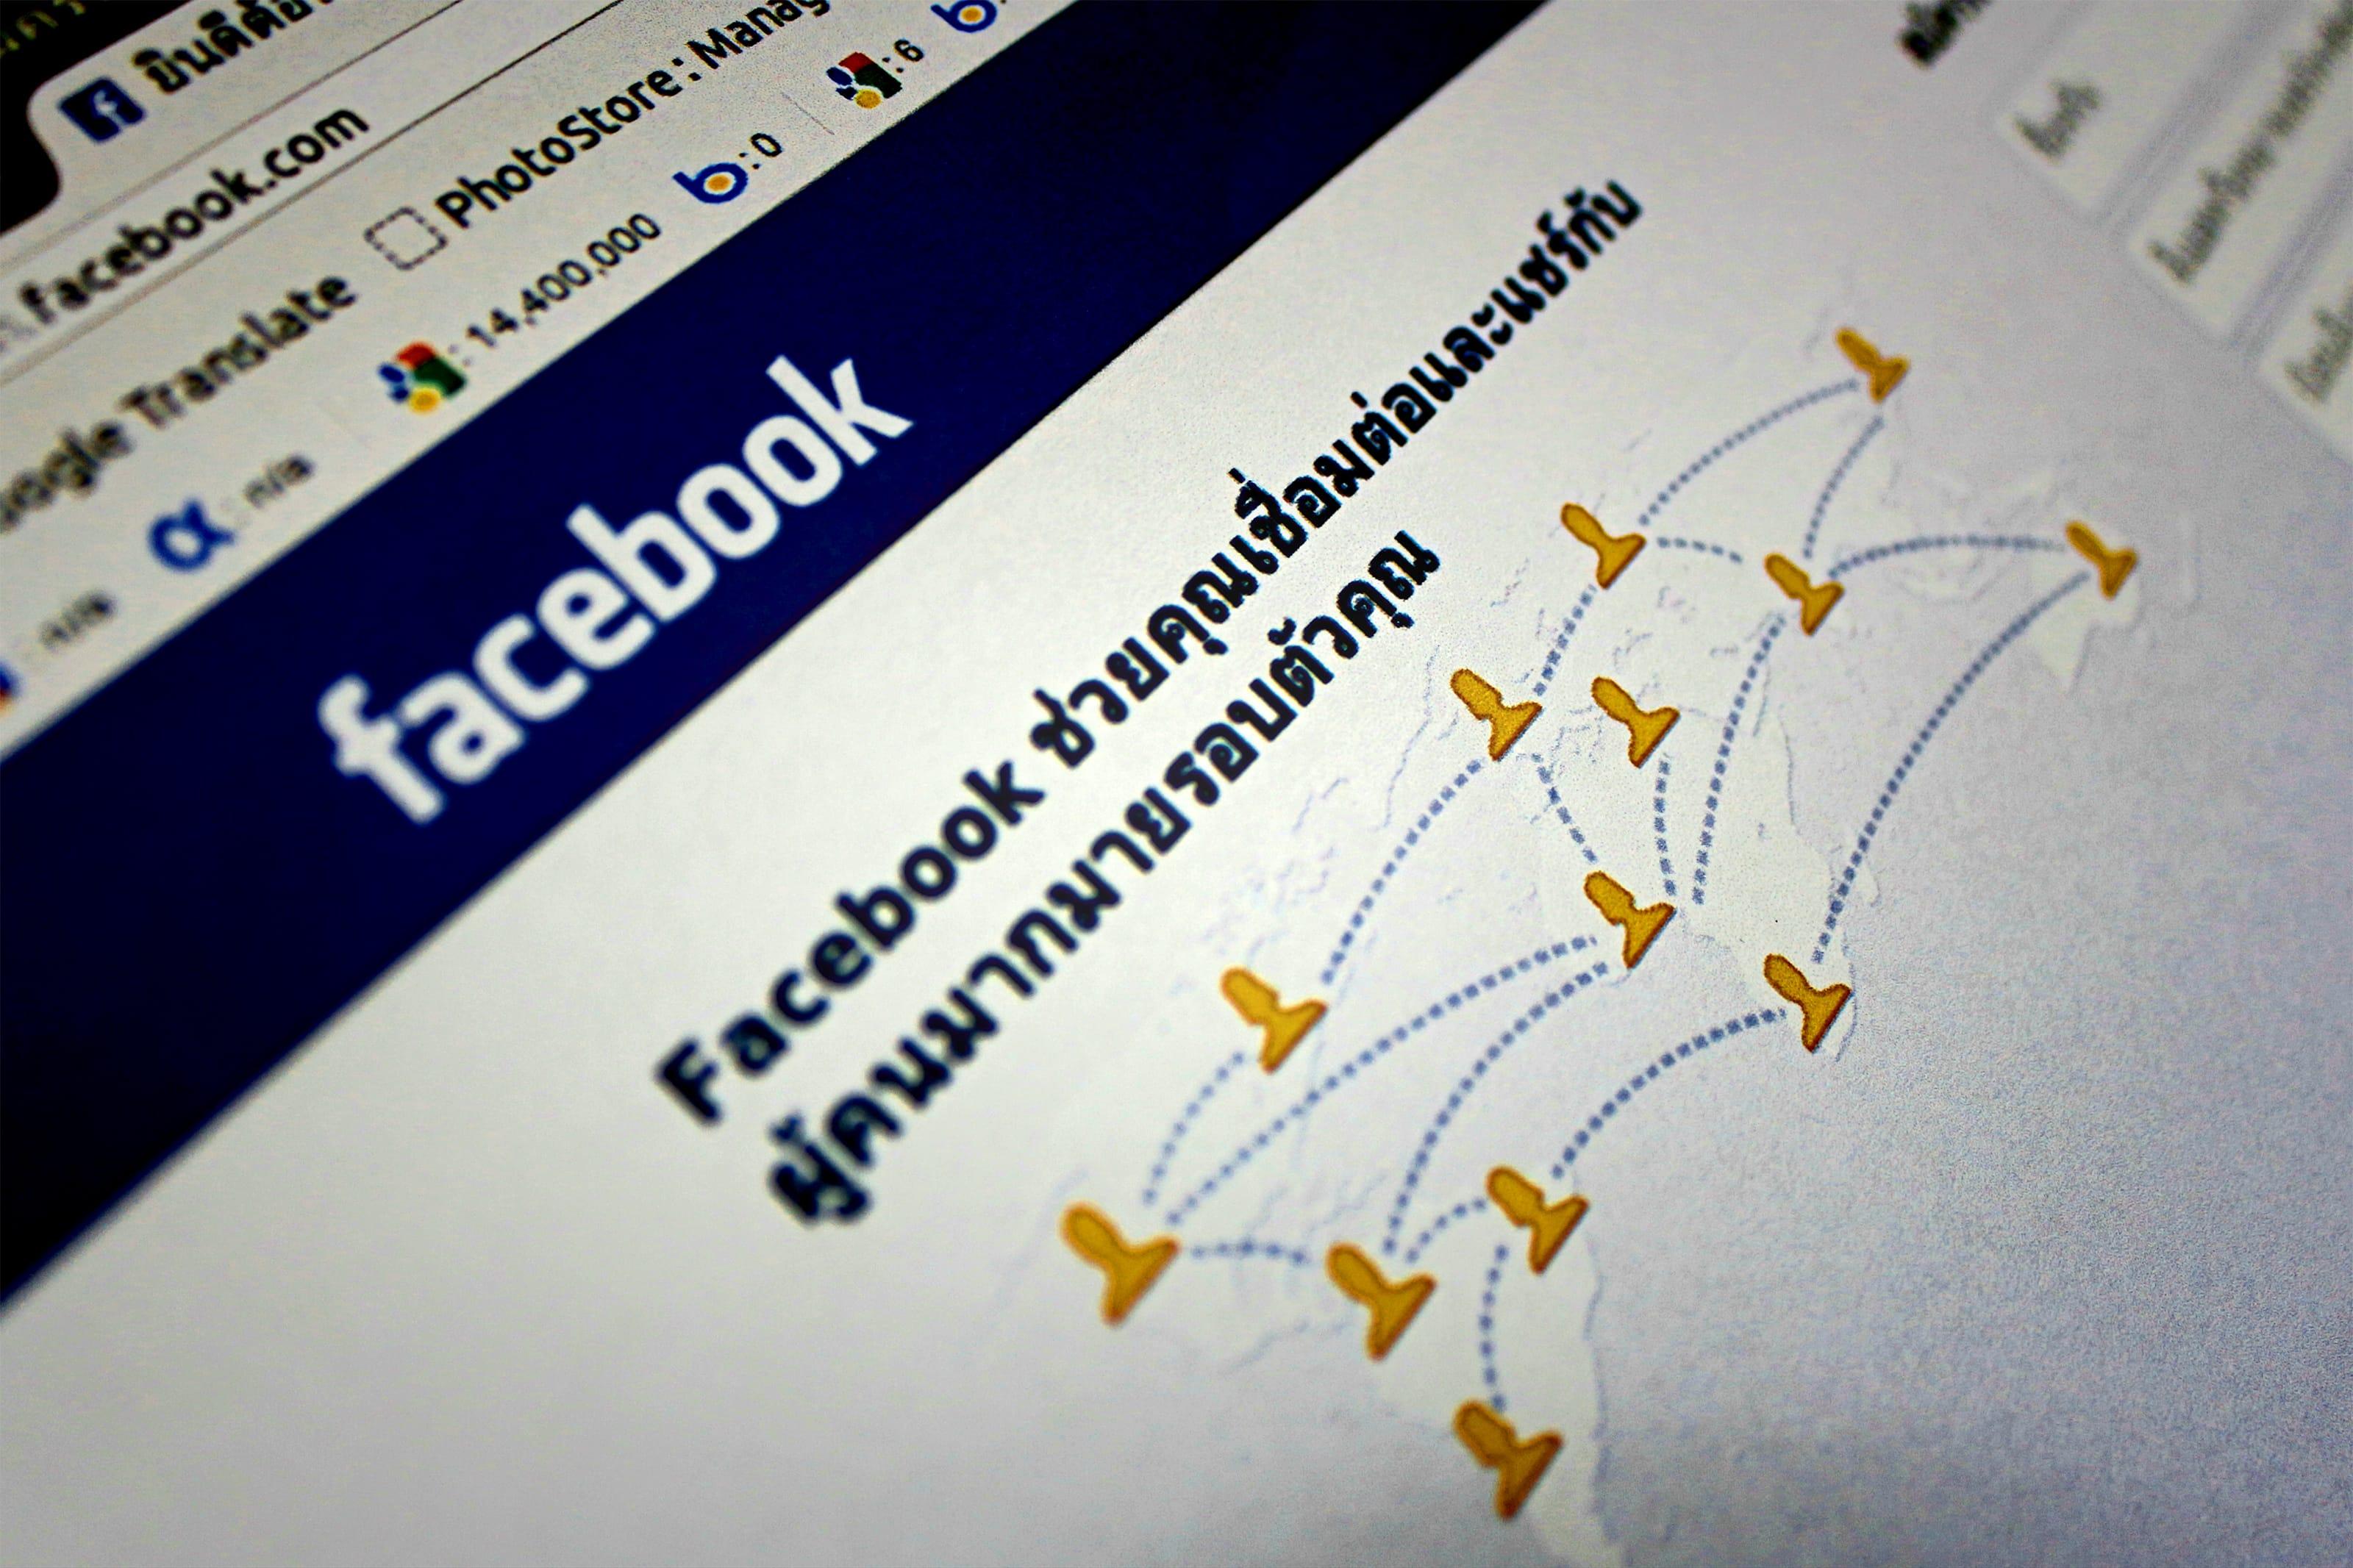 Facebook down: cosa è successo precisamente?